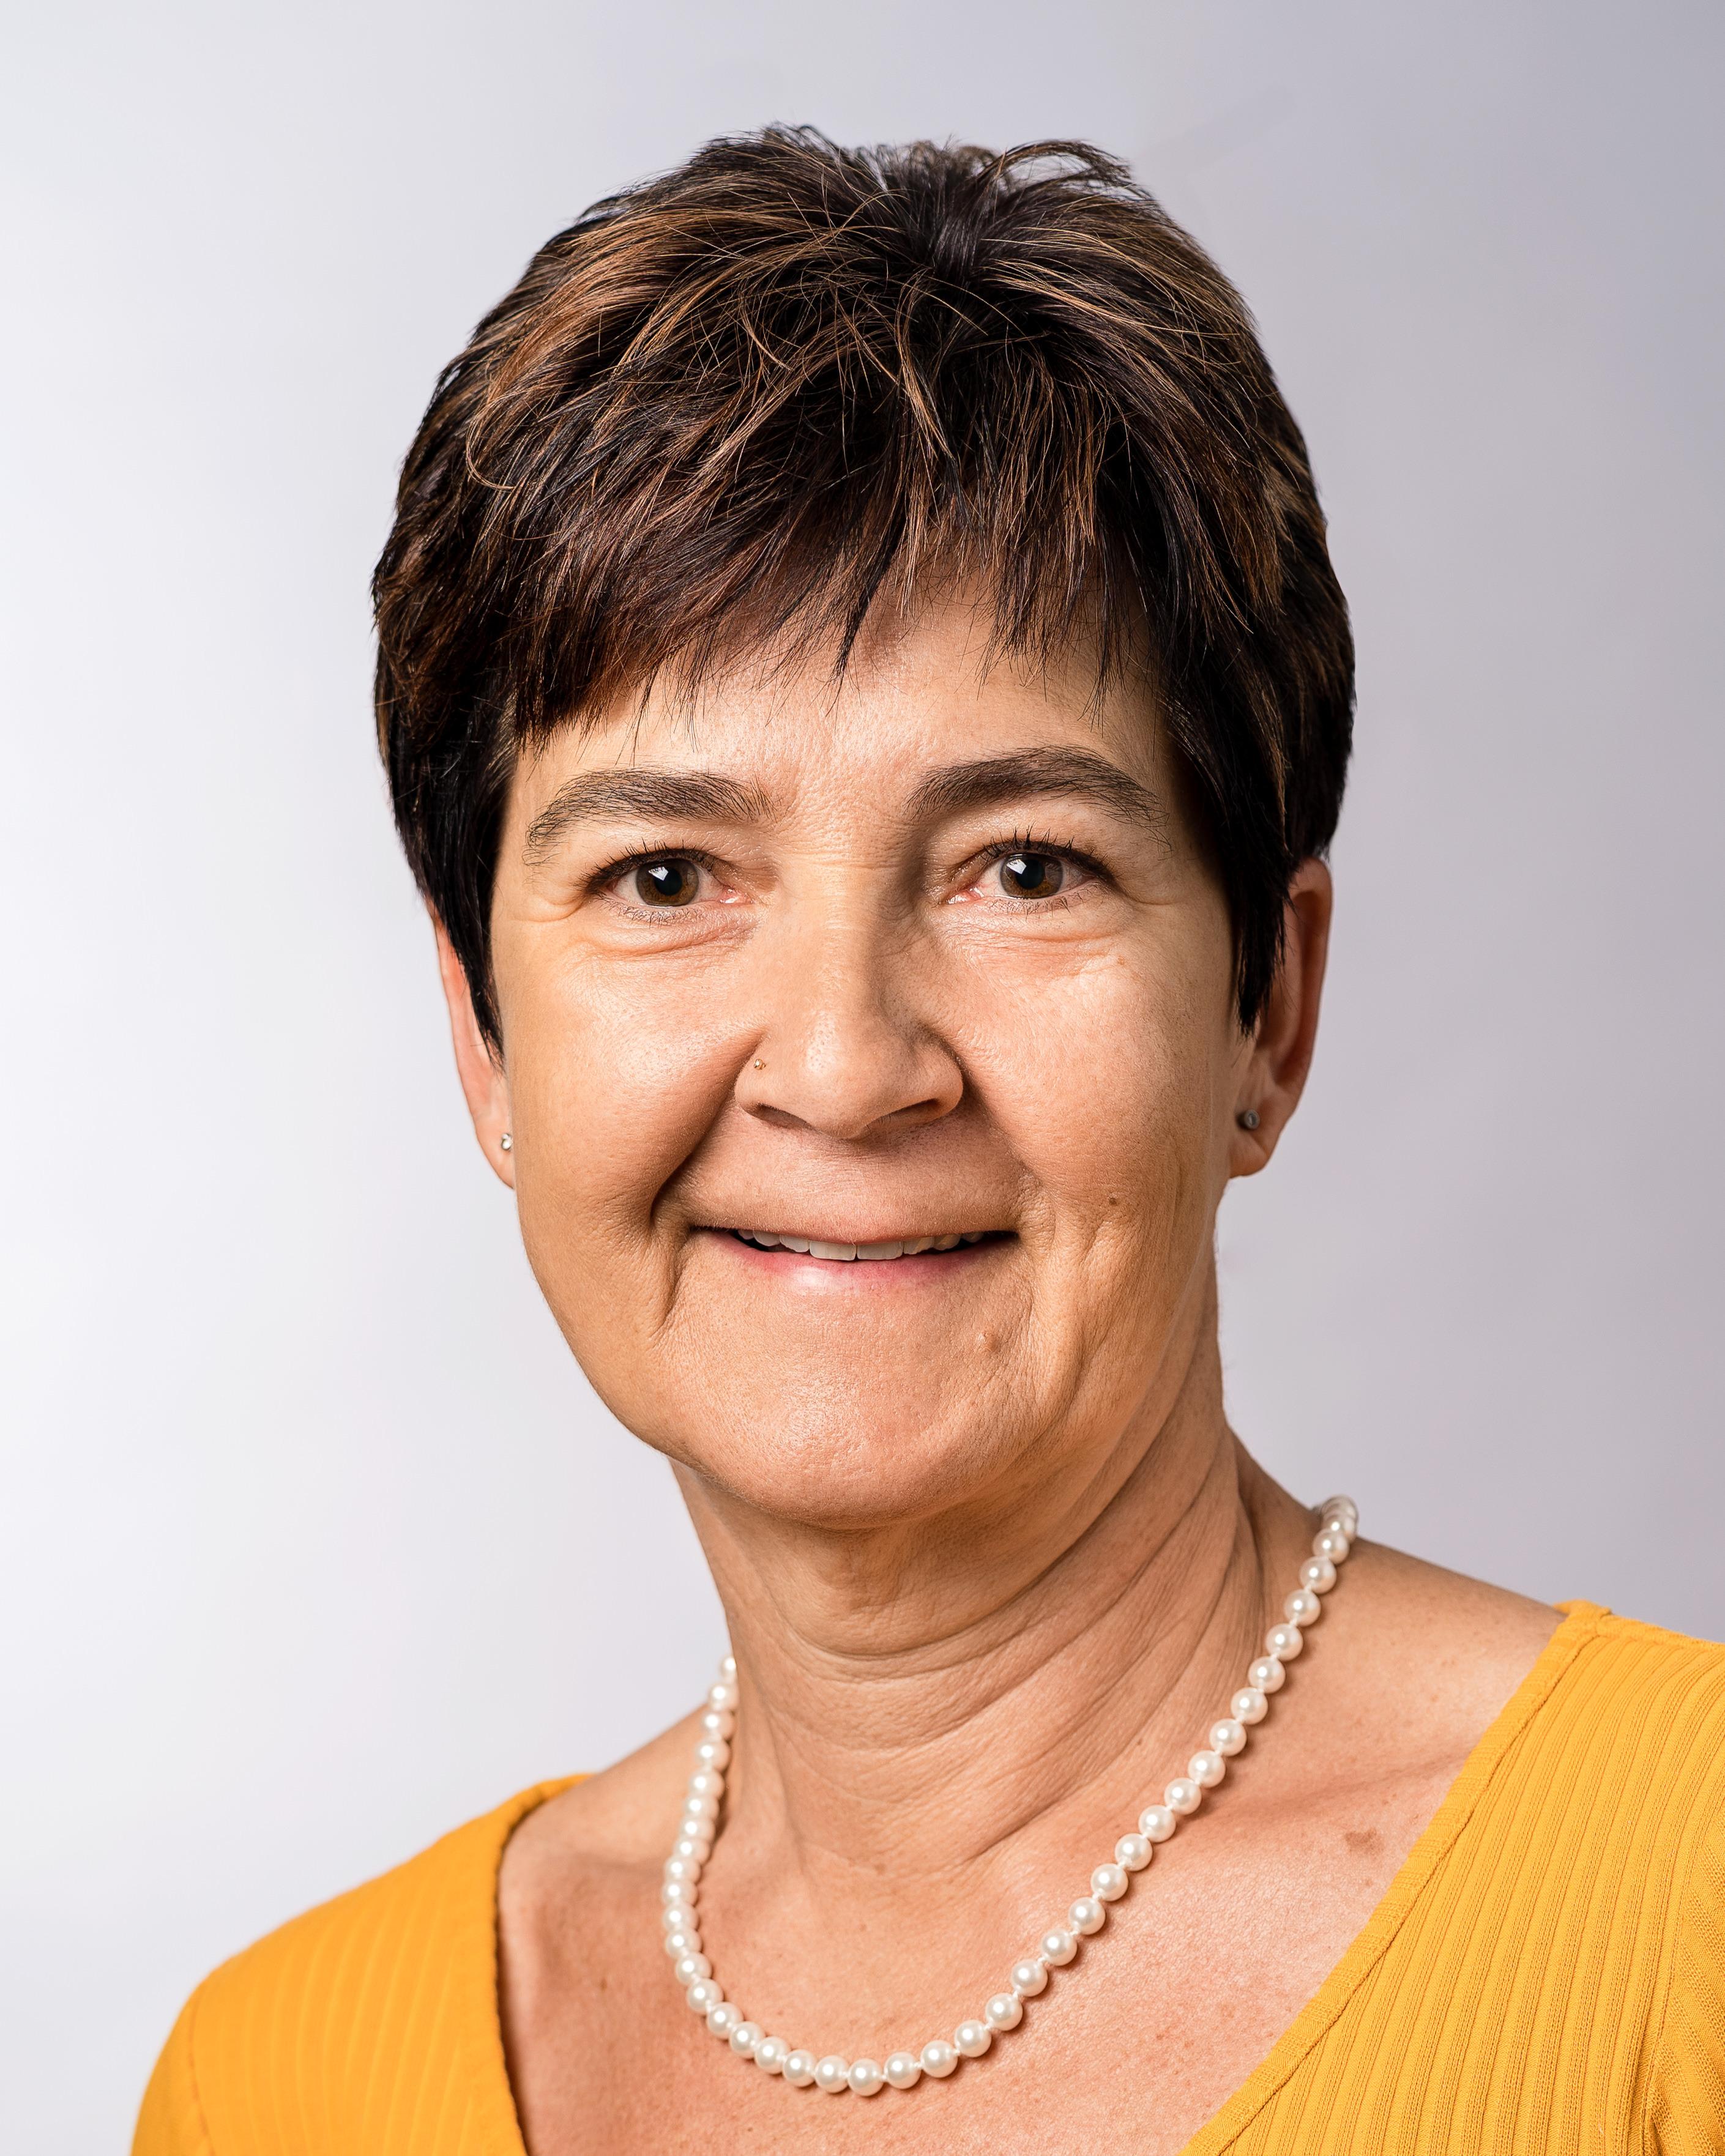 Silvia Galli